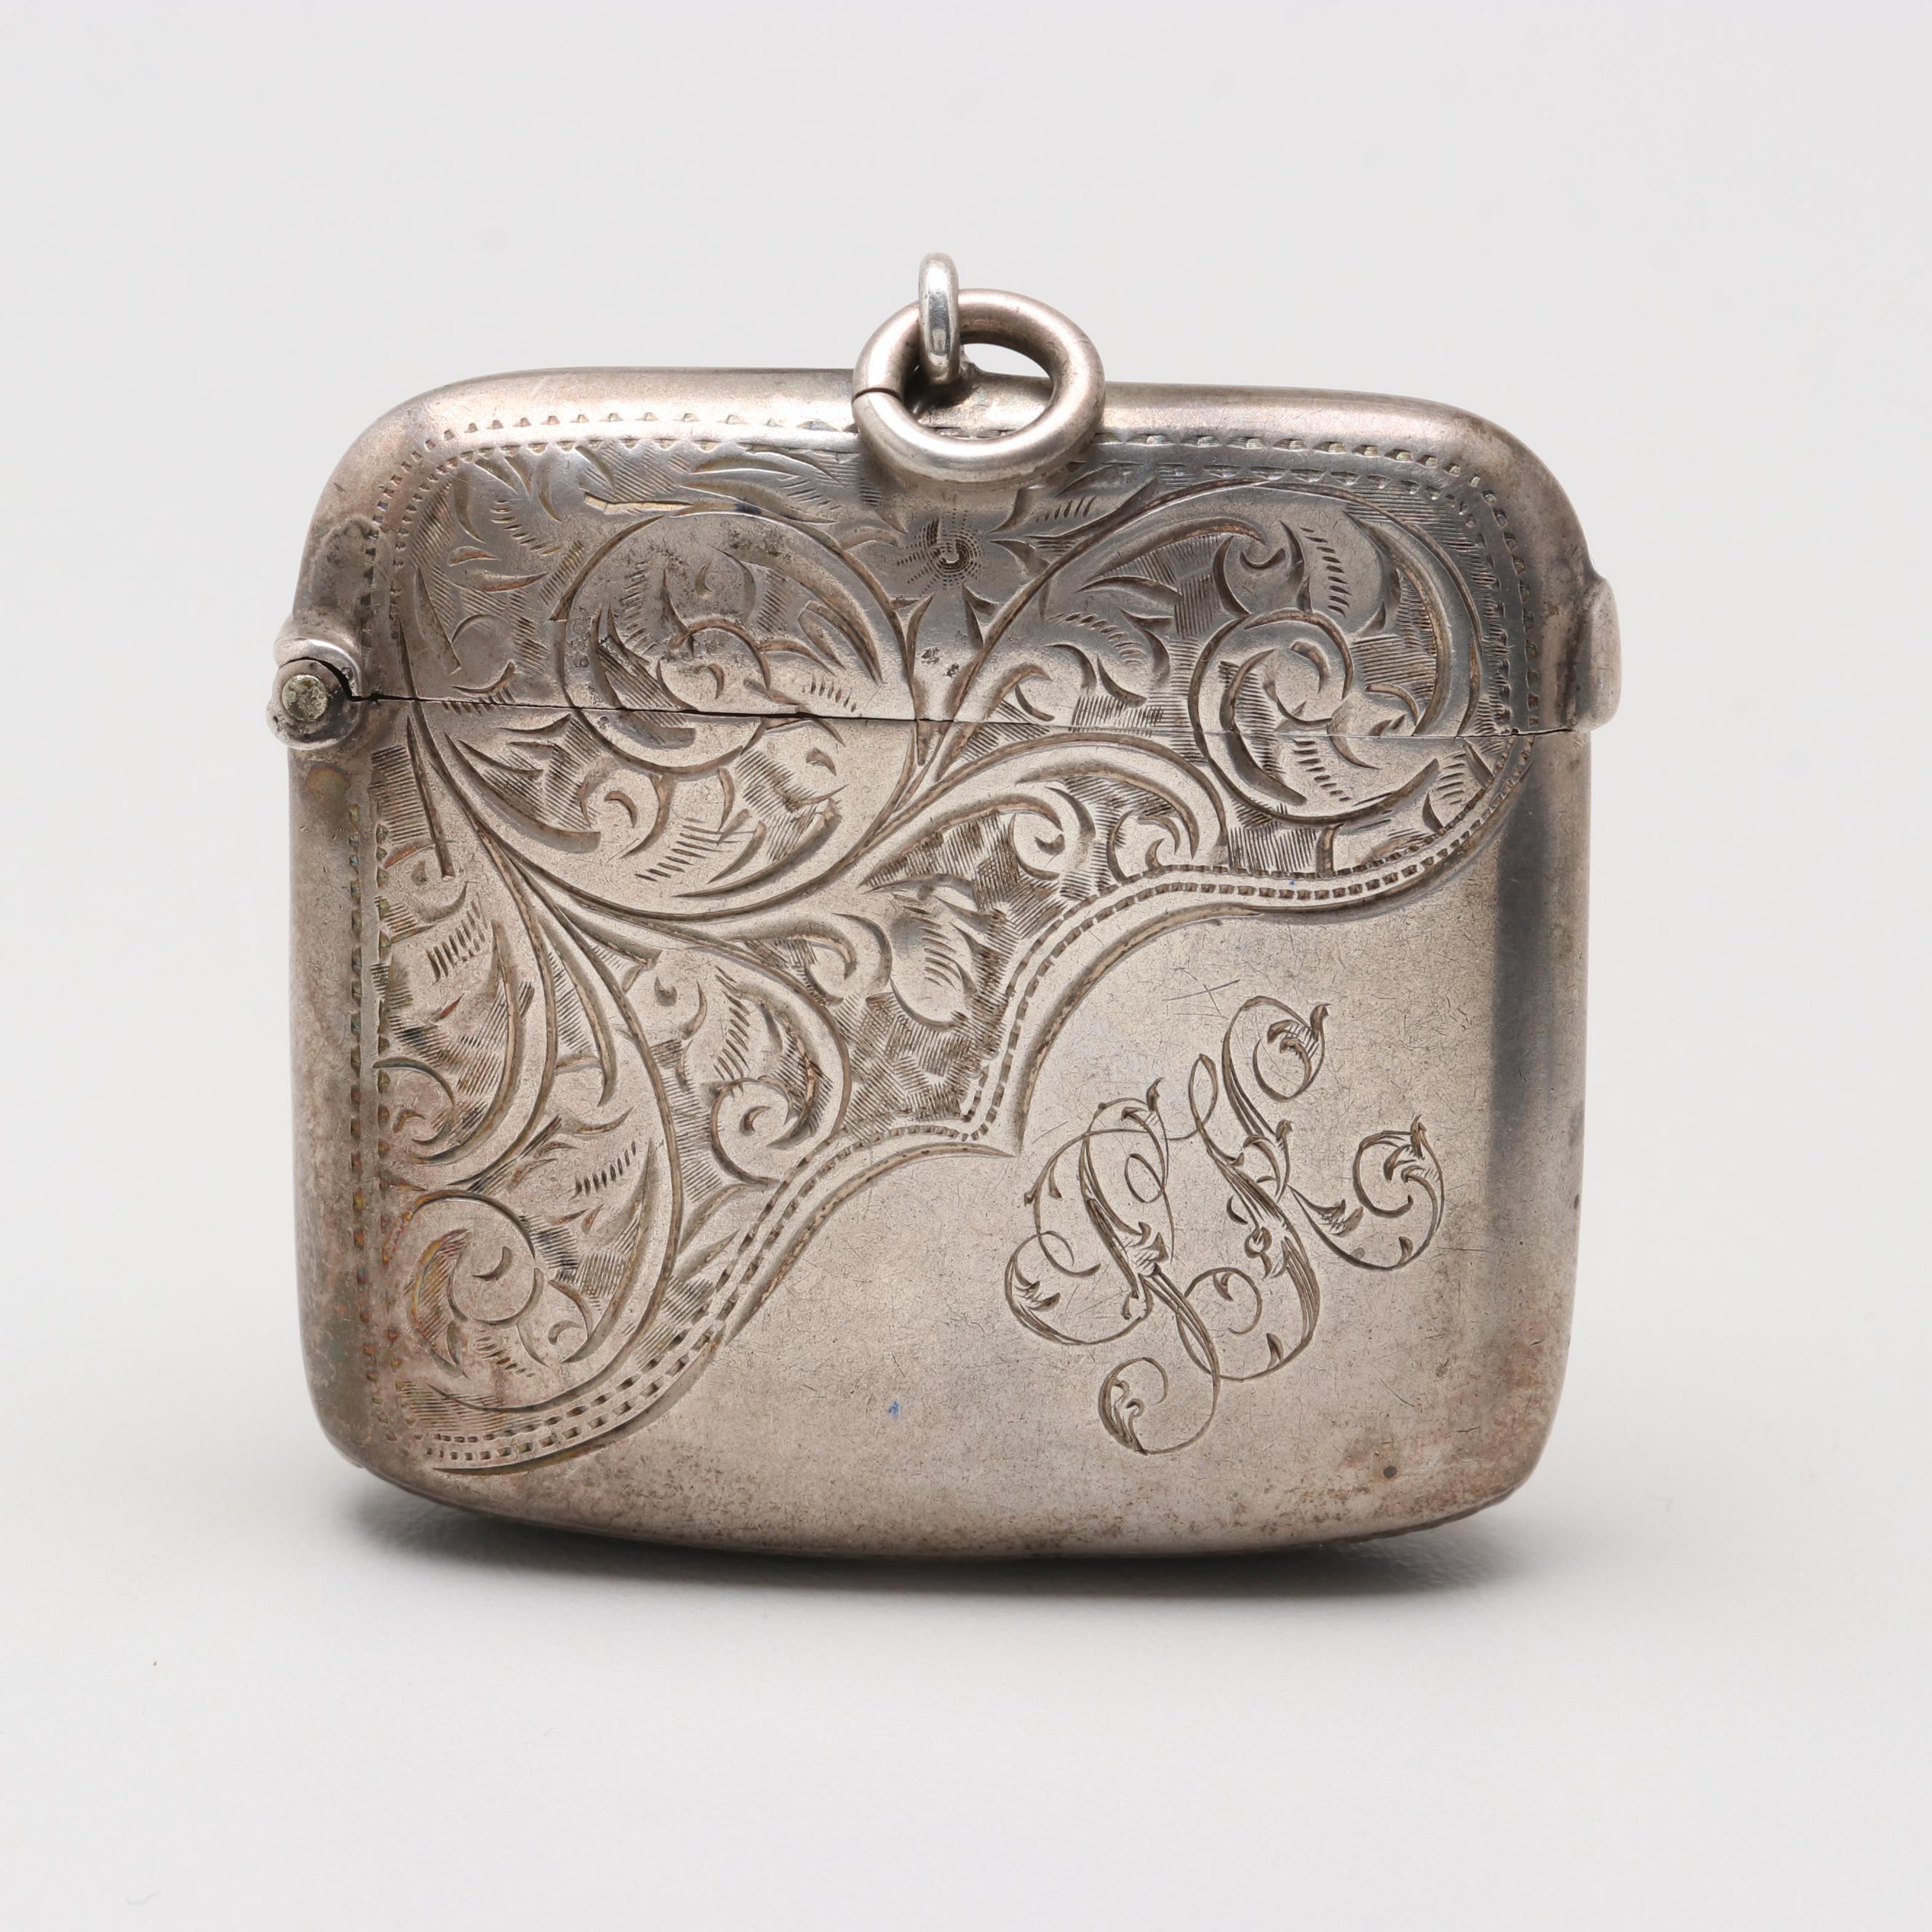 1902 Arthur Cook Sterling Silver Match Safe